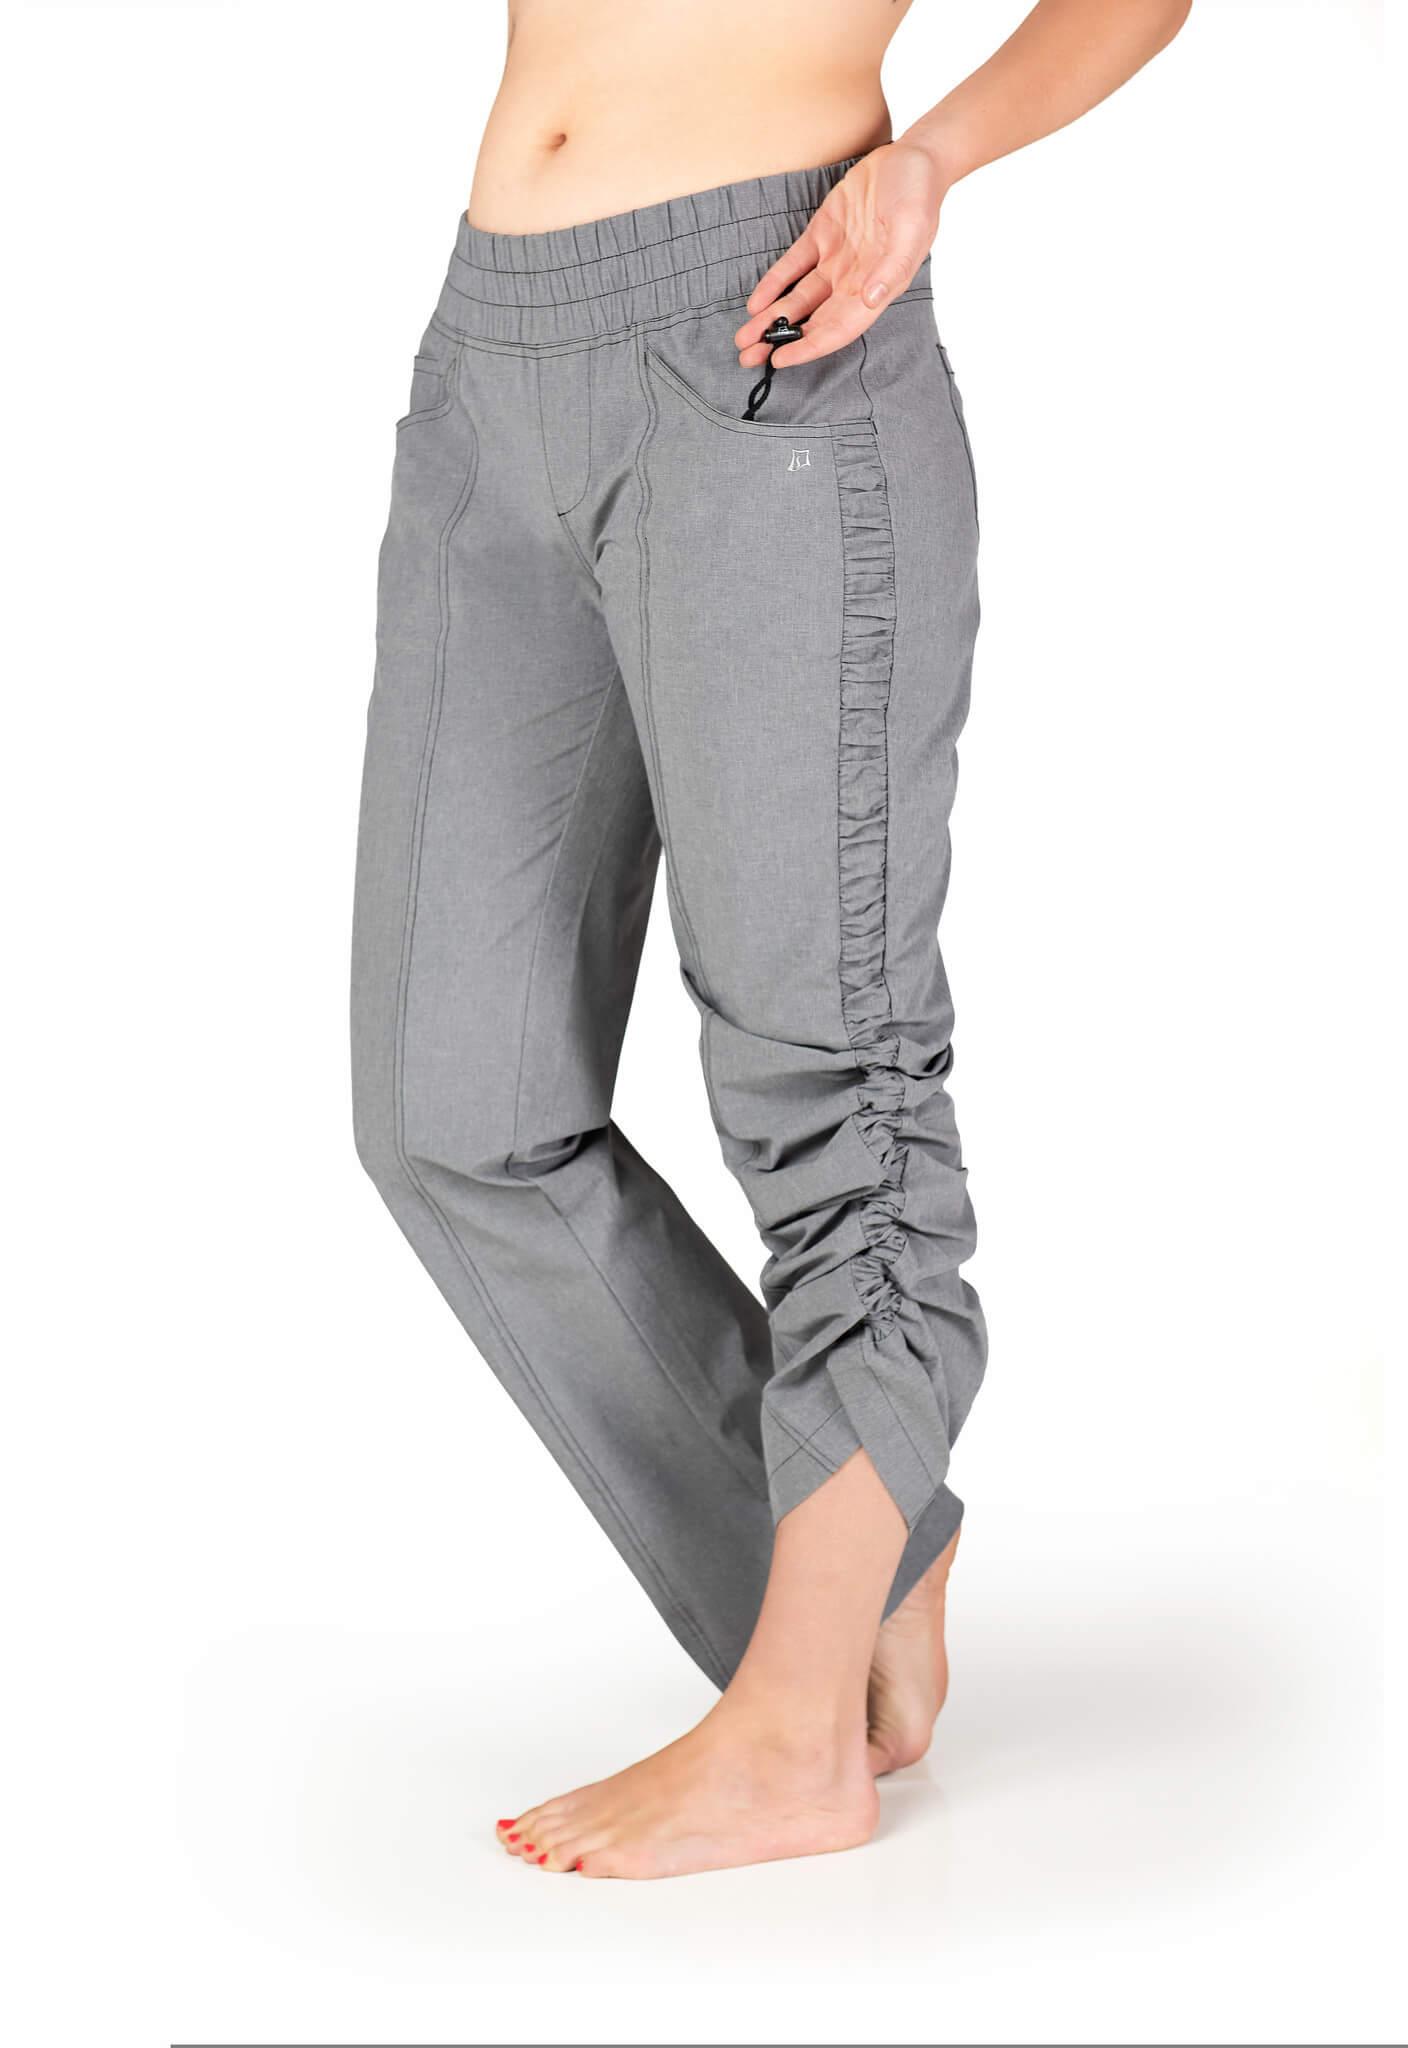 Female hiker wearing gray SkirtSports pants